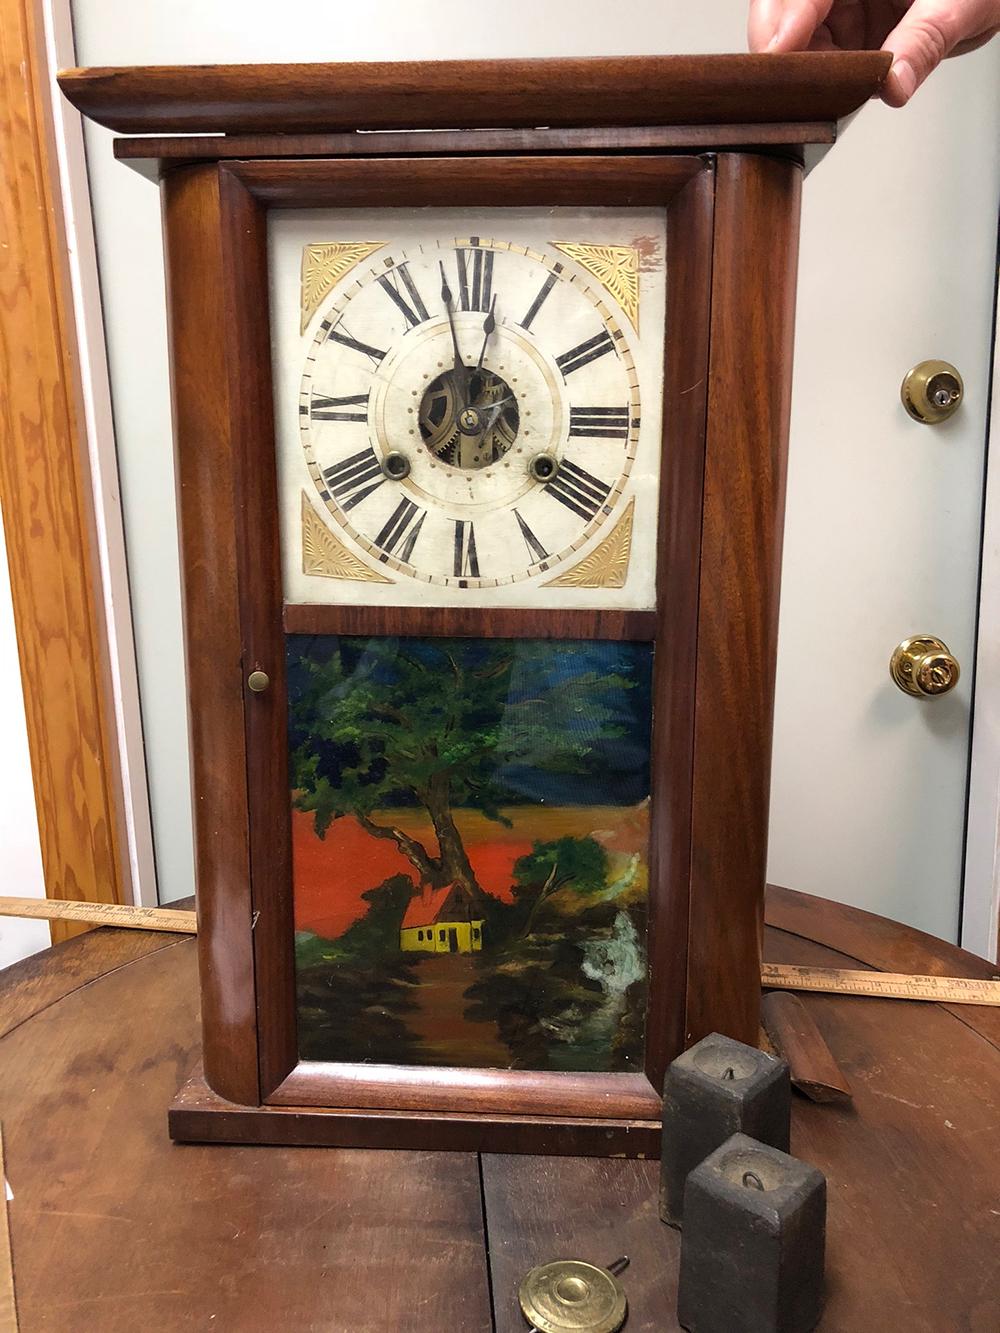 H. Welton Shelf Clock